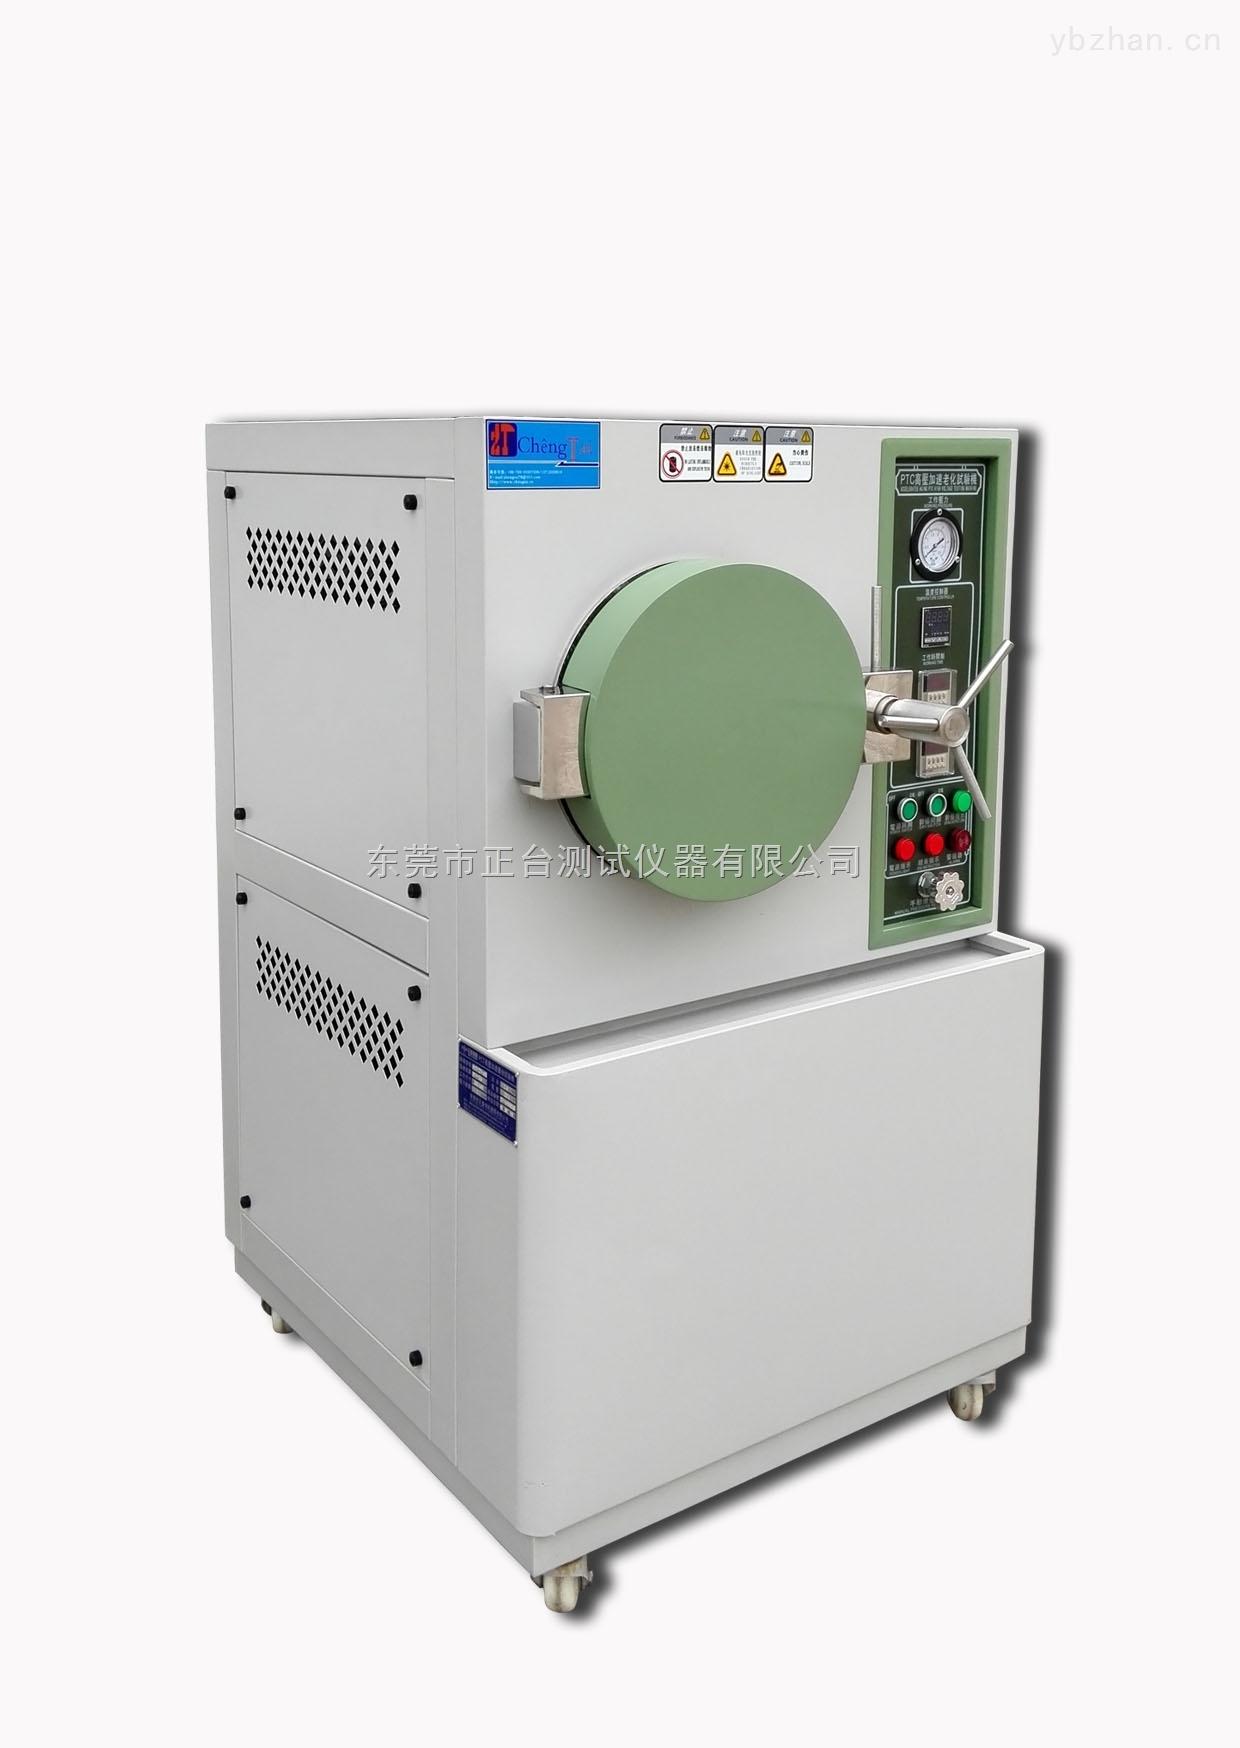 pct高压蒸煮试验仪,pct高压蒸煮箱